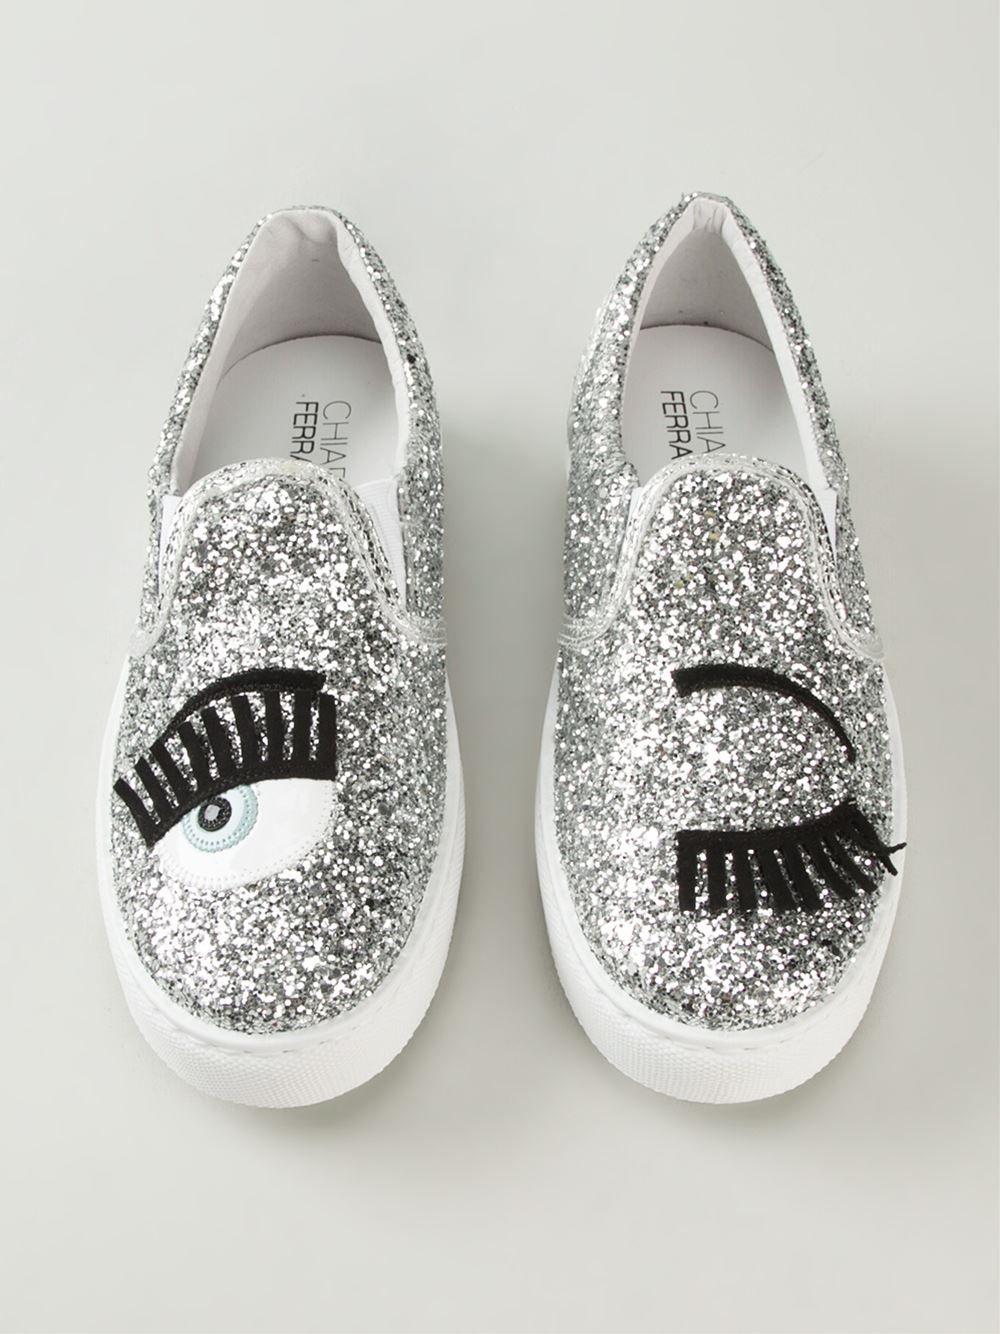 outlet store 5ee71 0d0b3 Chiara Ferragni 'Flirting' slip-on sneakers   Chiara ...